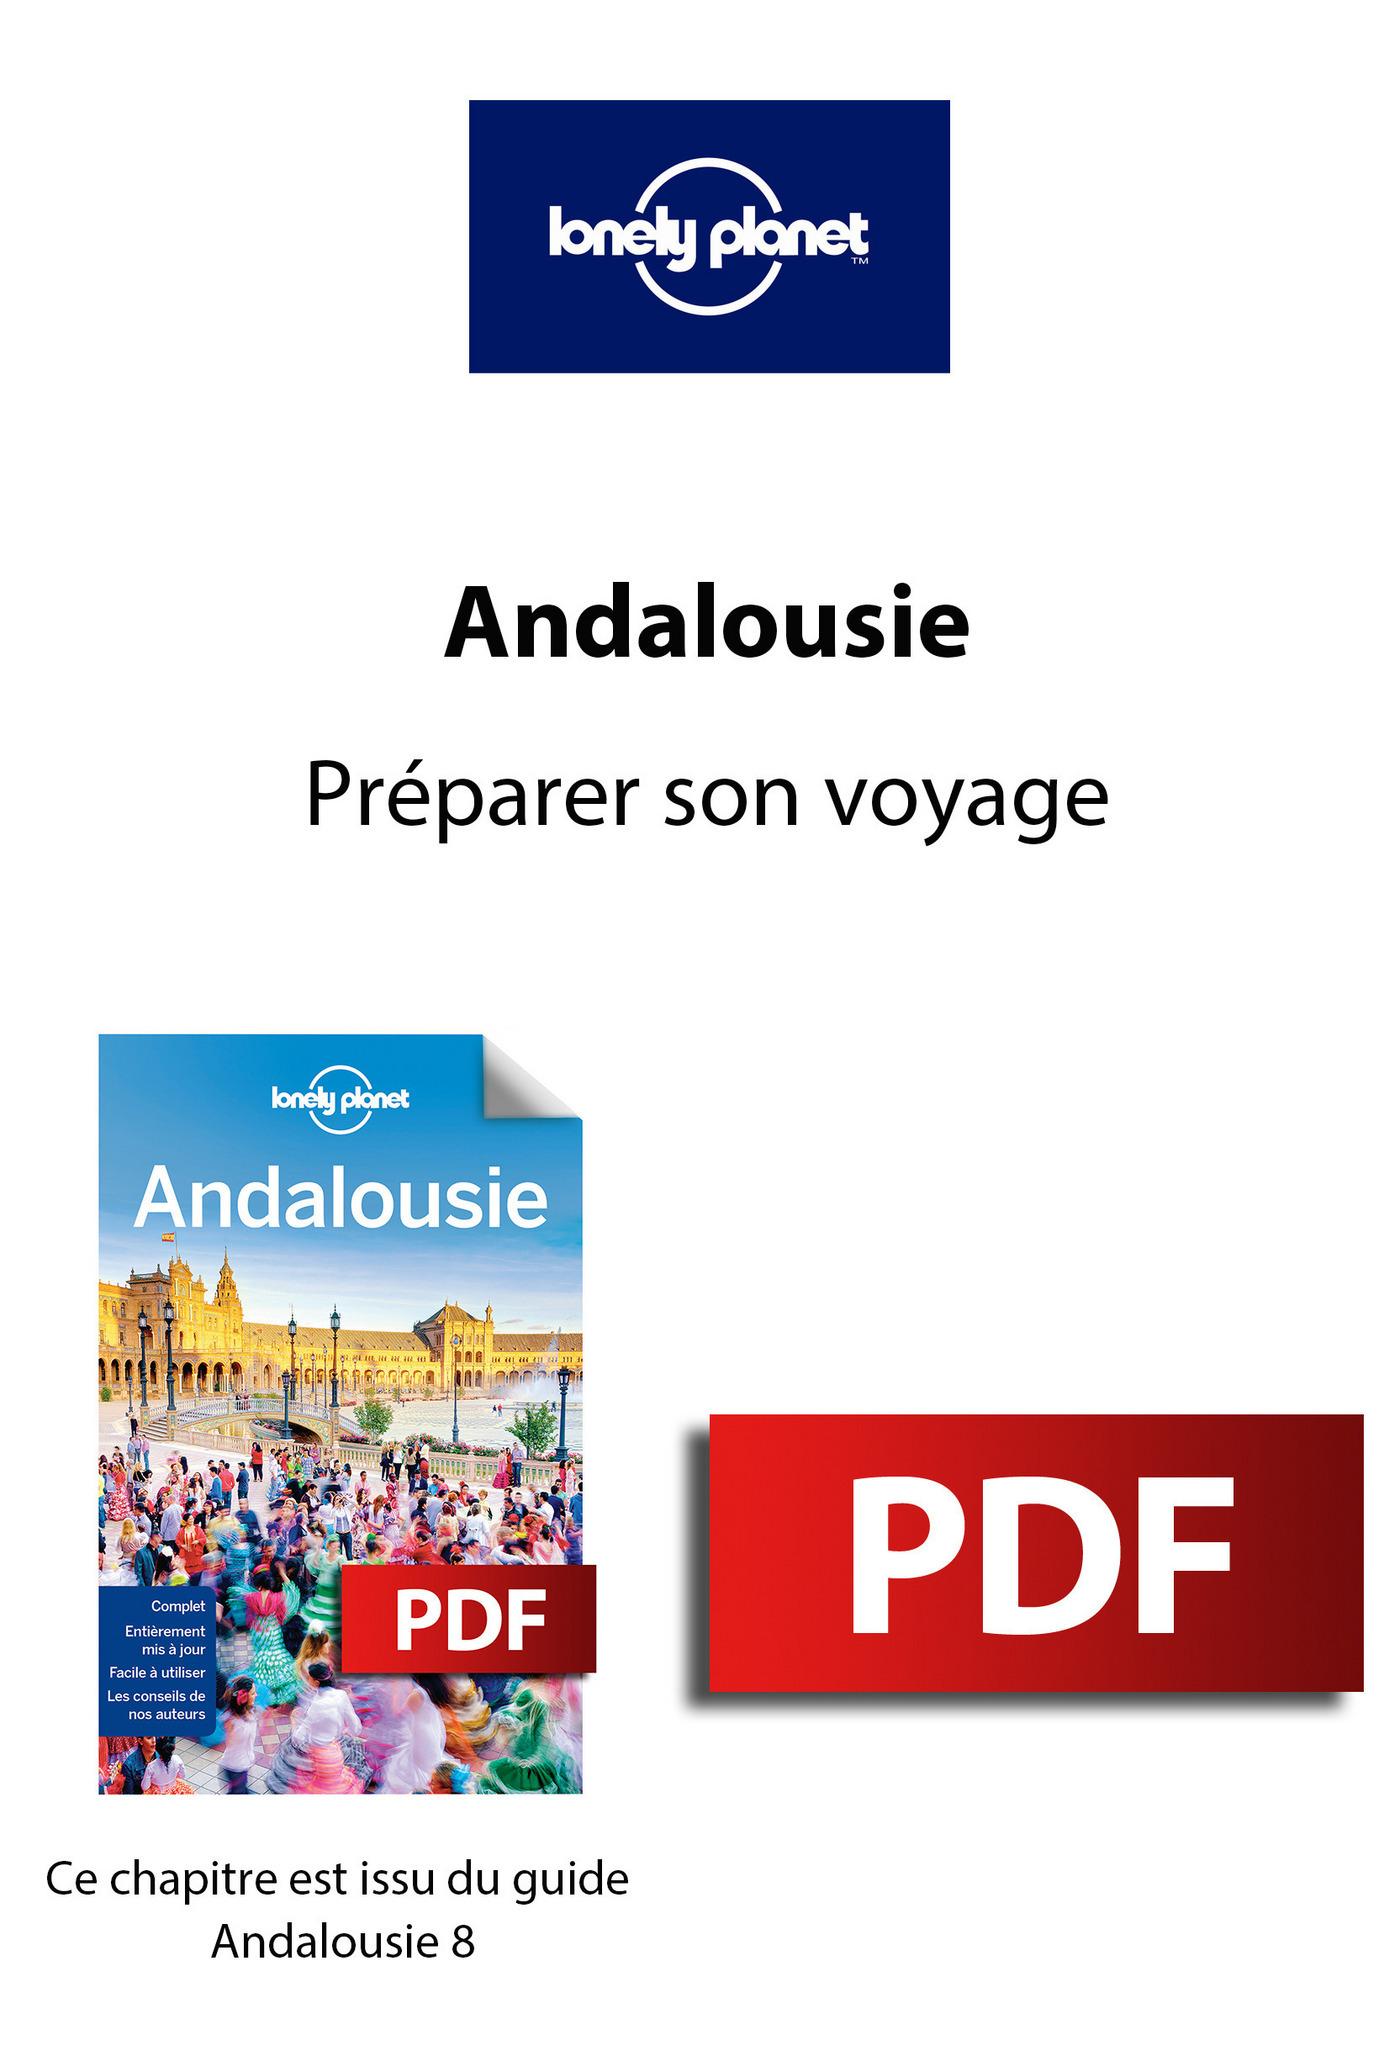 Andalousie - Préparer son voyage